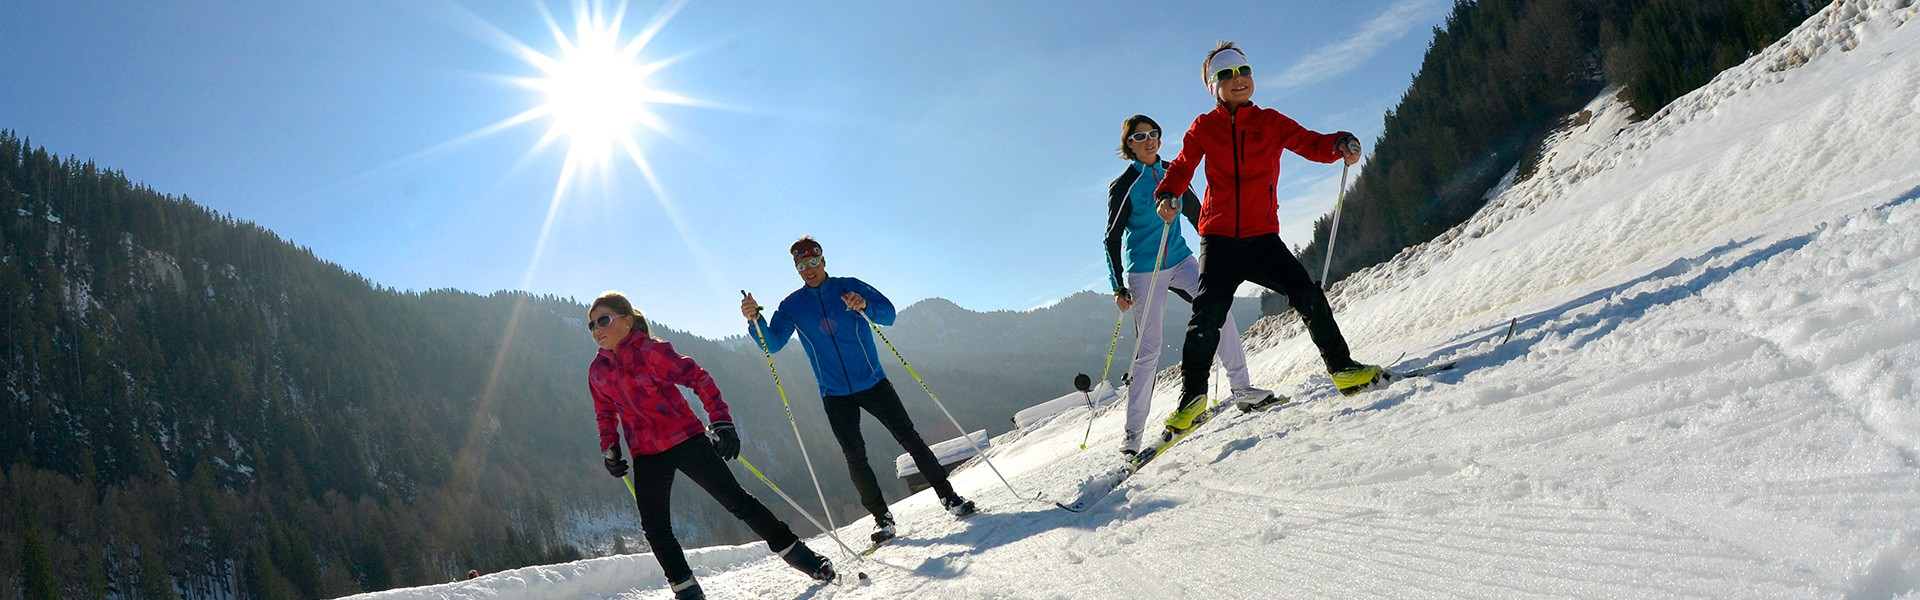 017-a-ski-de-fond-david-machet-h14-2598